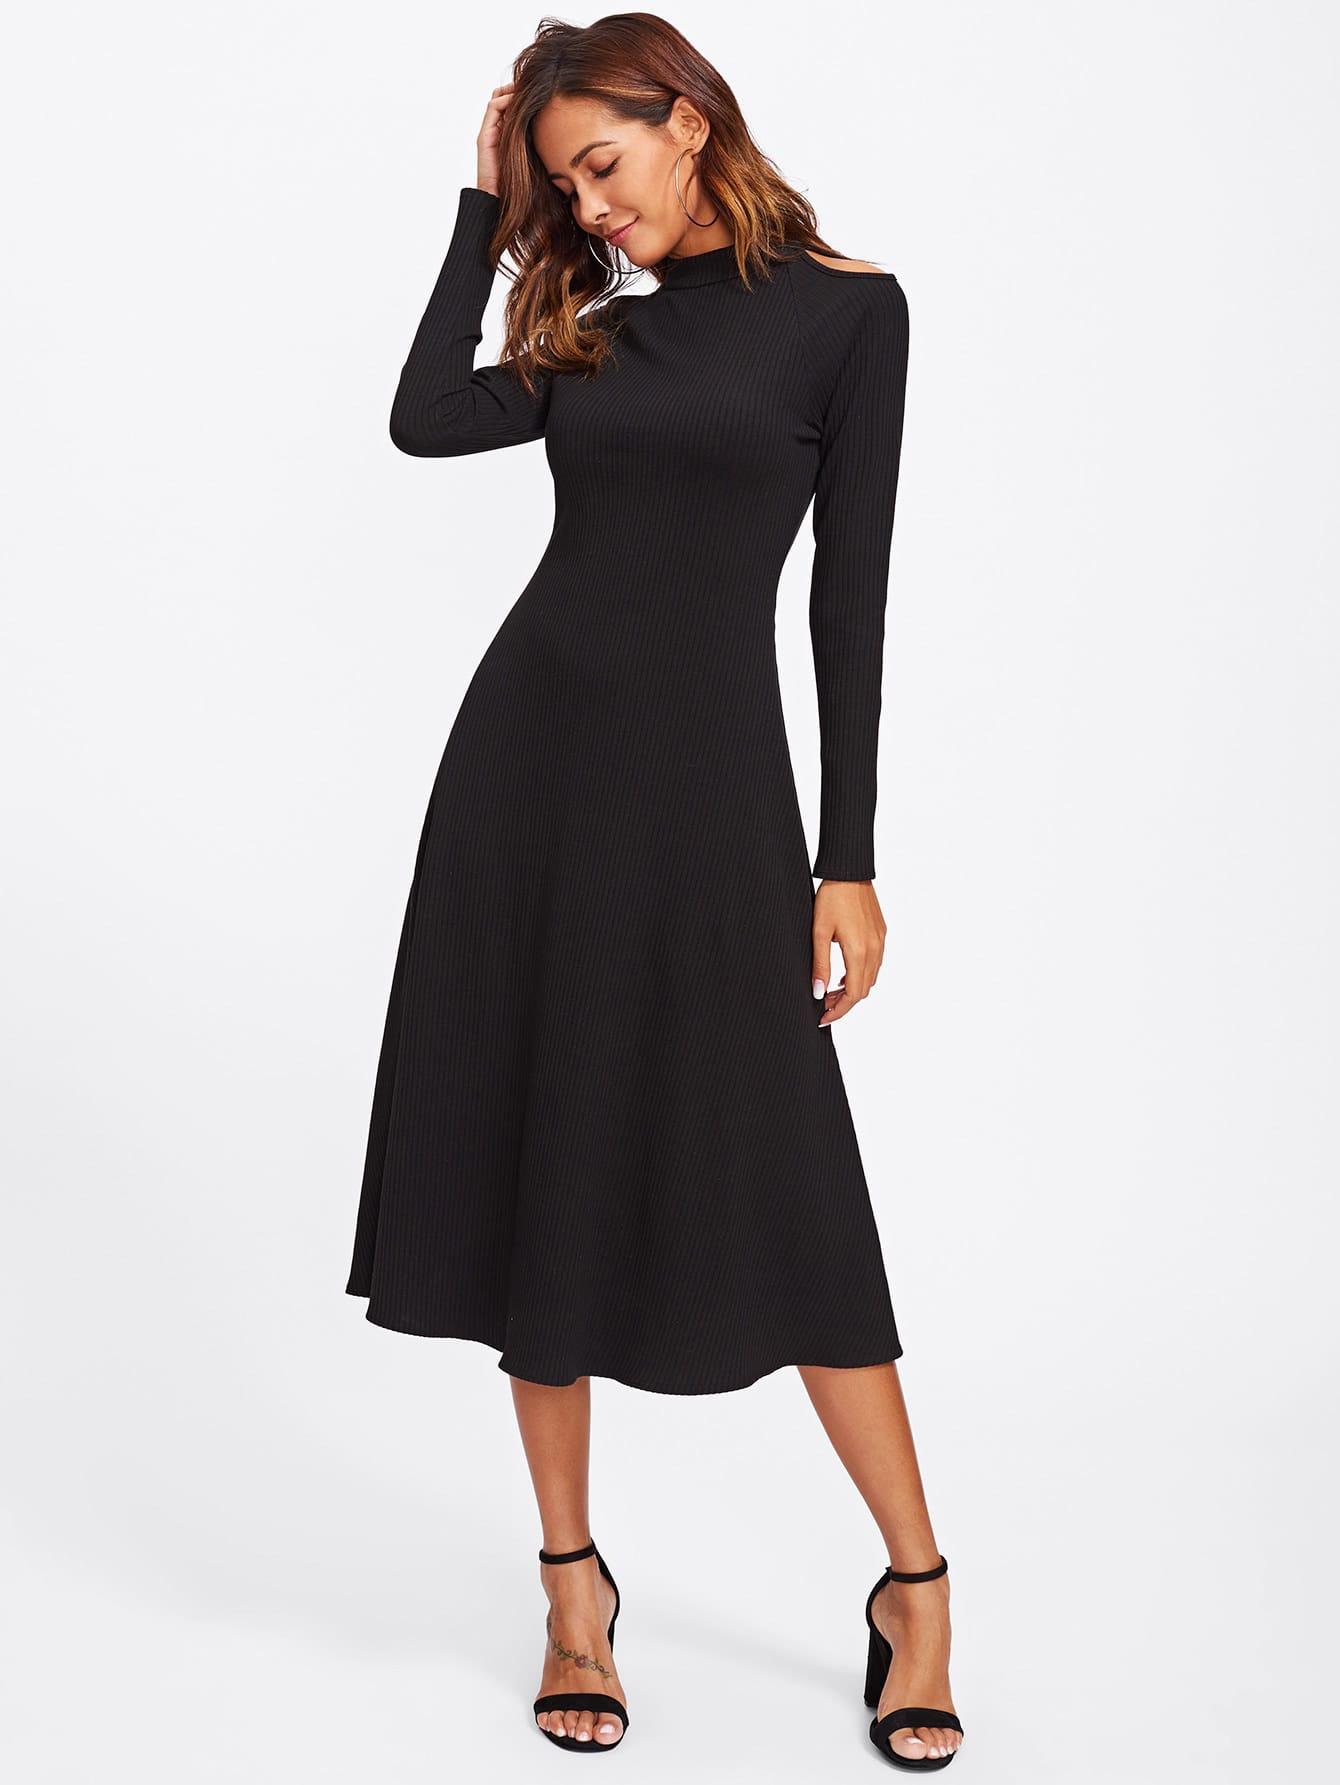 Cutout Shoulder Raglan Sleeve Ribbed Dress dress170830708